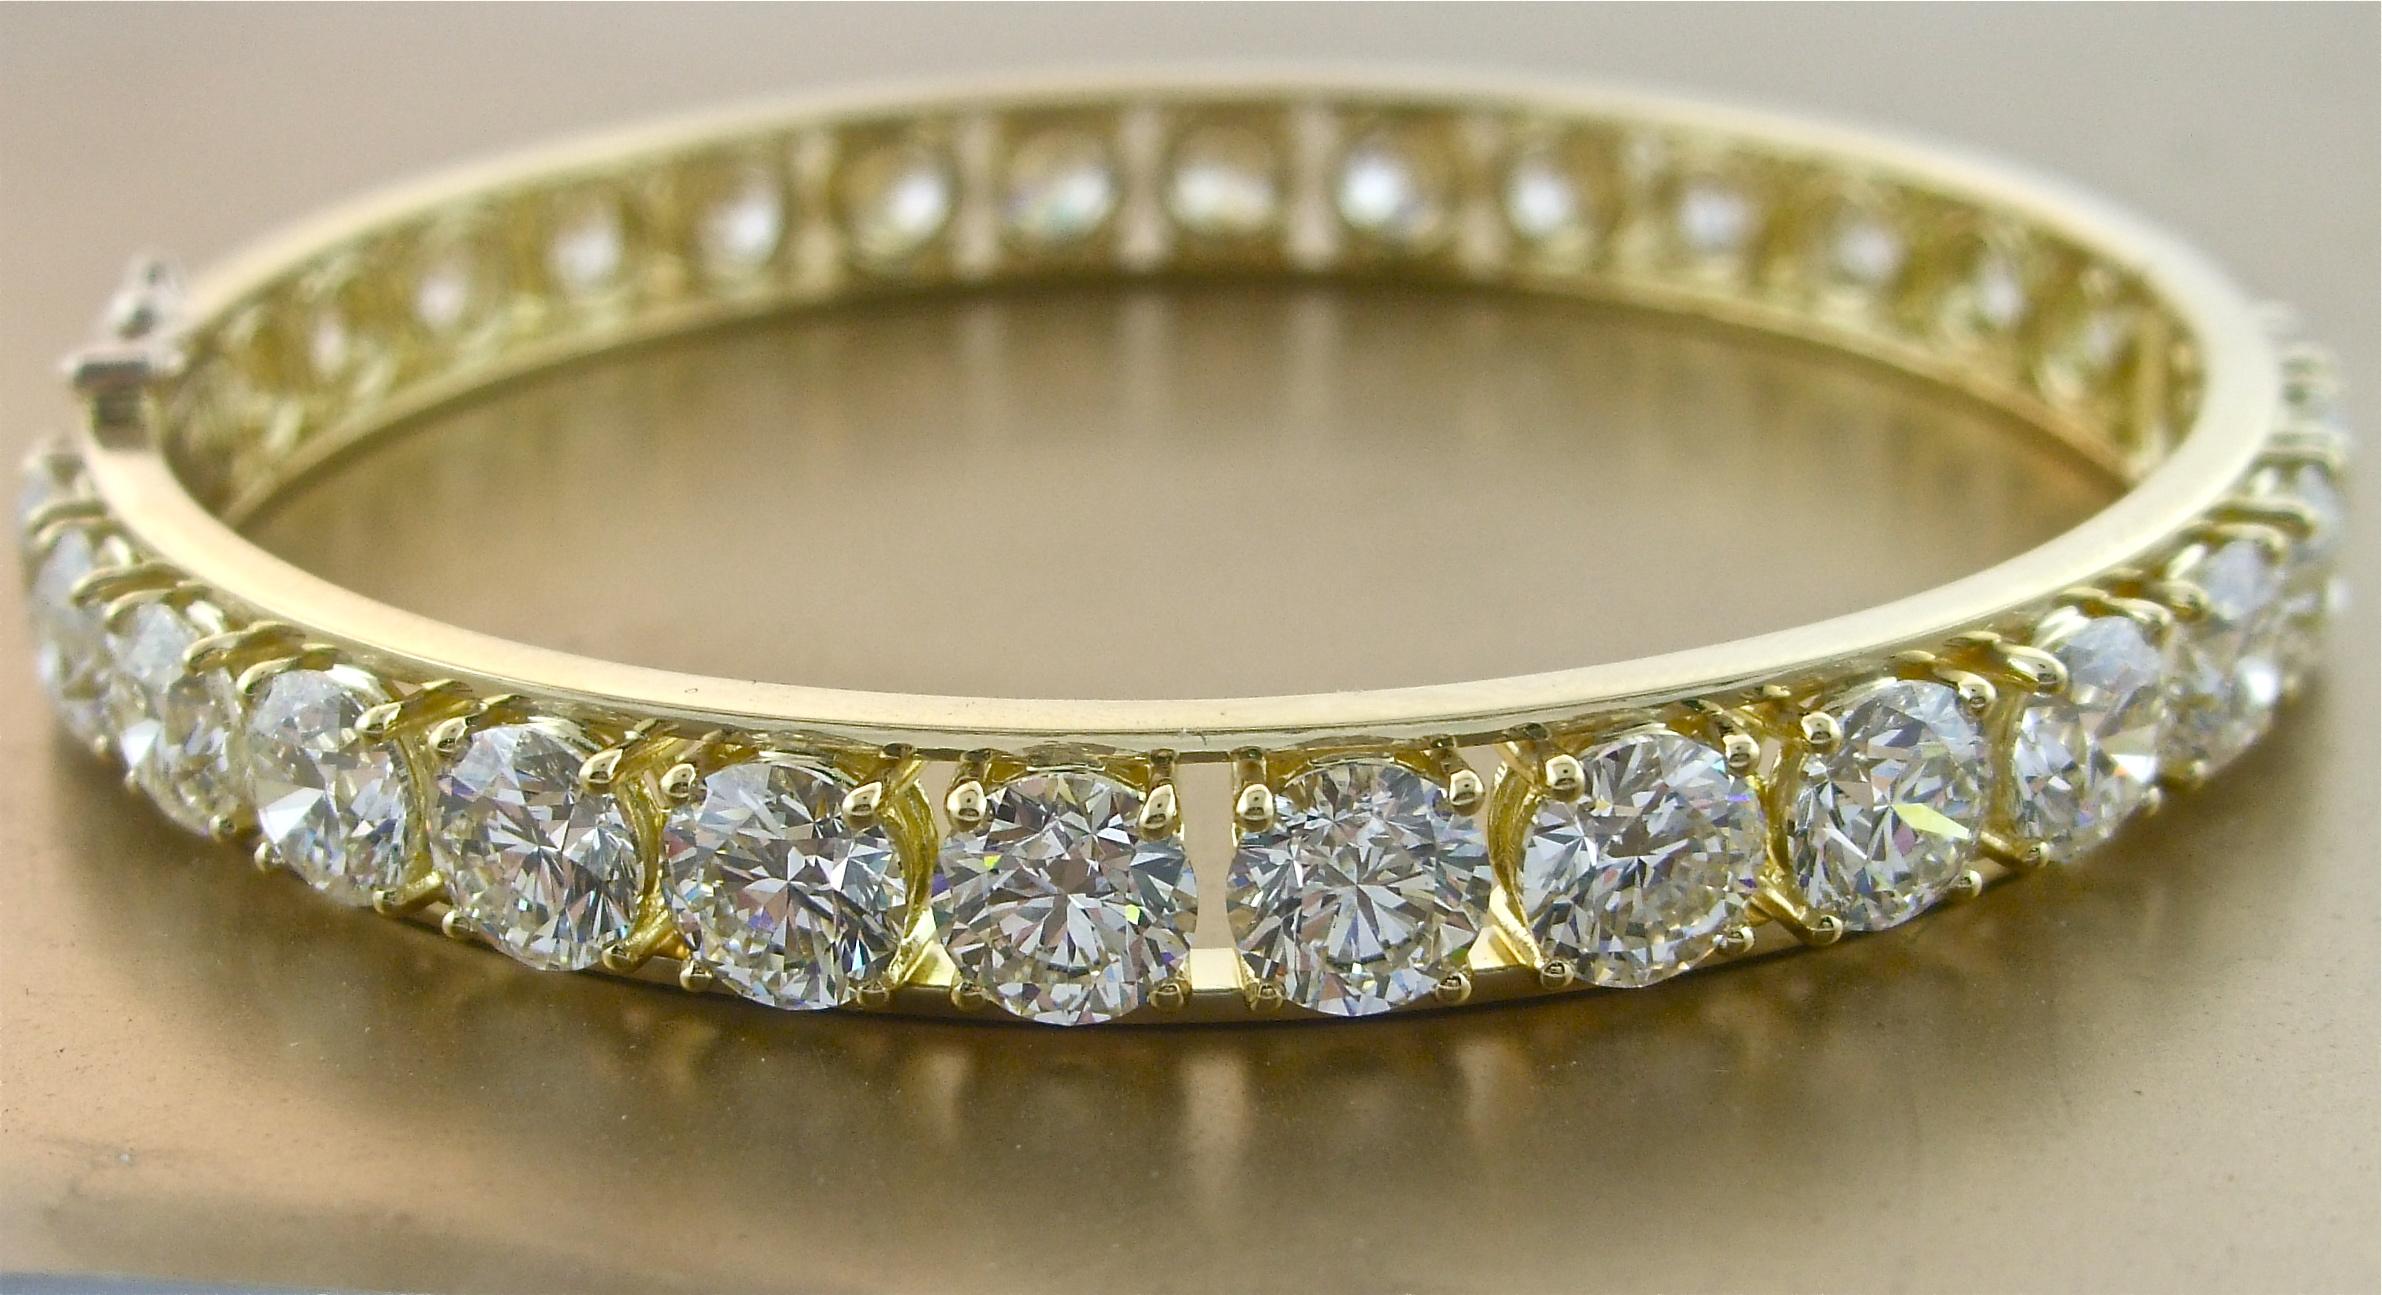 Diamond Bangle - Item No: 0013471